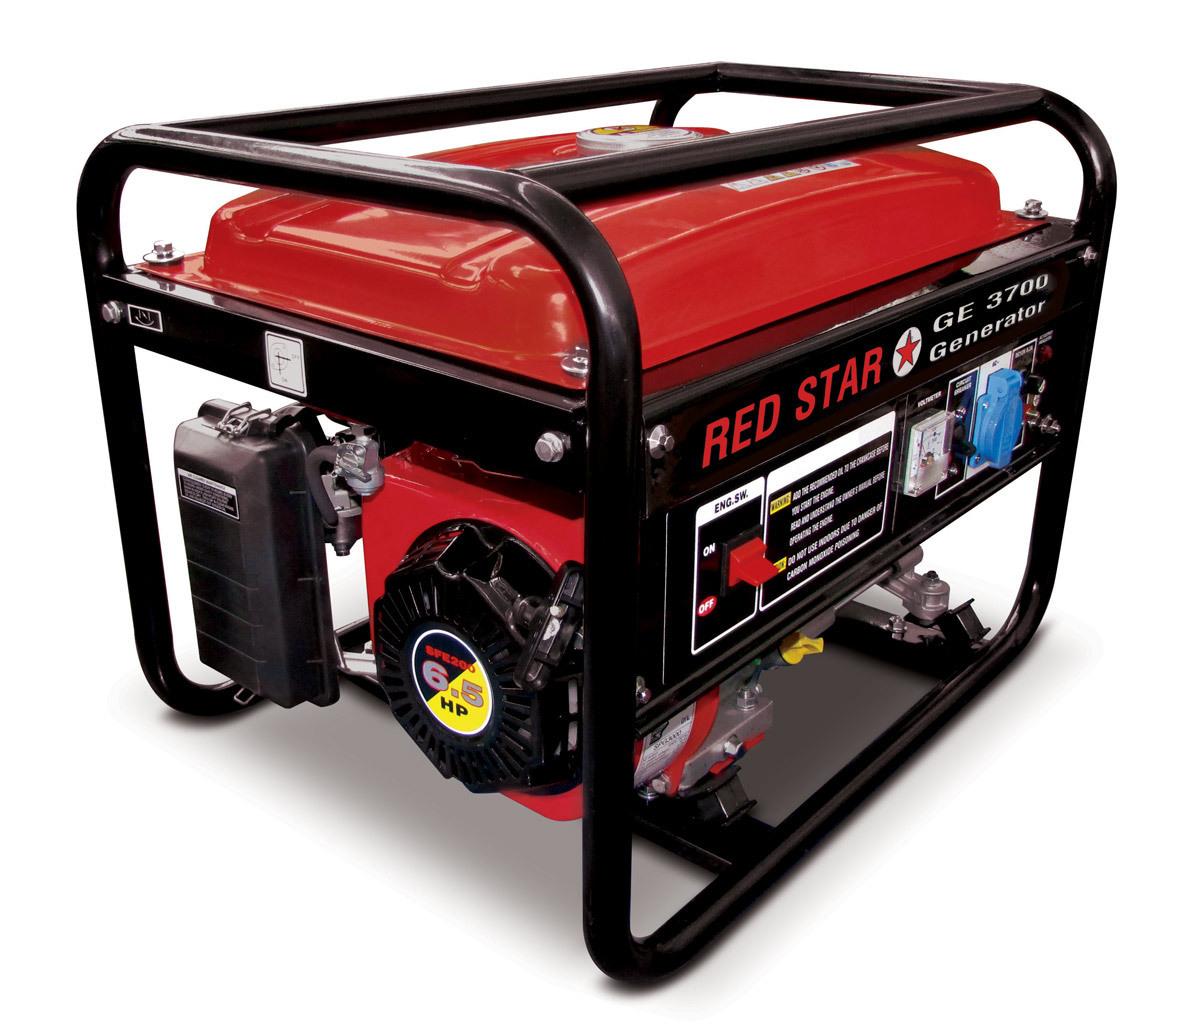 Generatore di corrente mosa ge 3700 red star 2 8kw for Generatore di corrente lidl